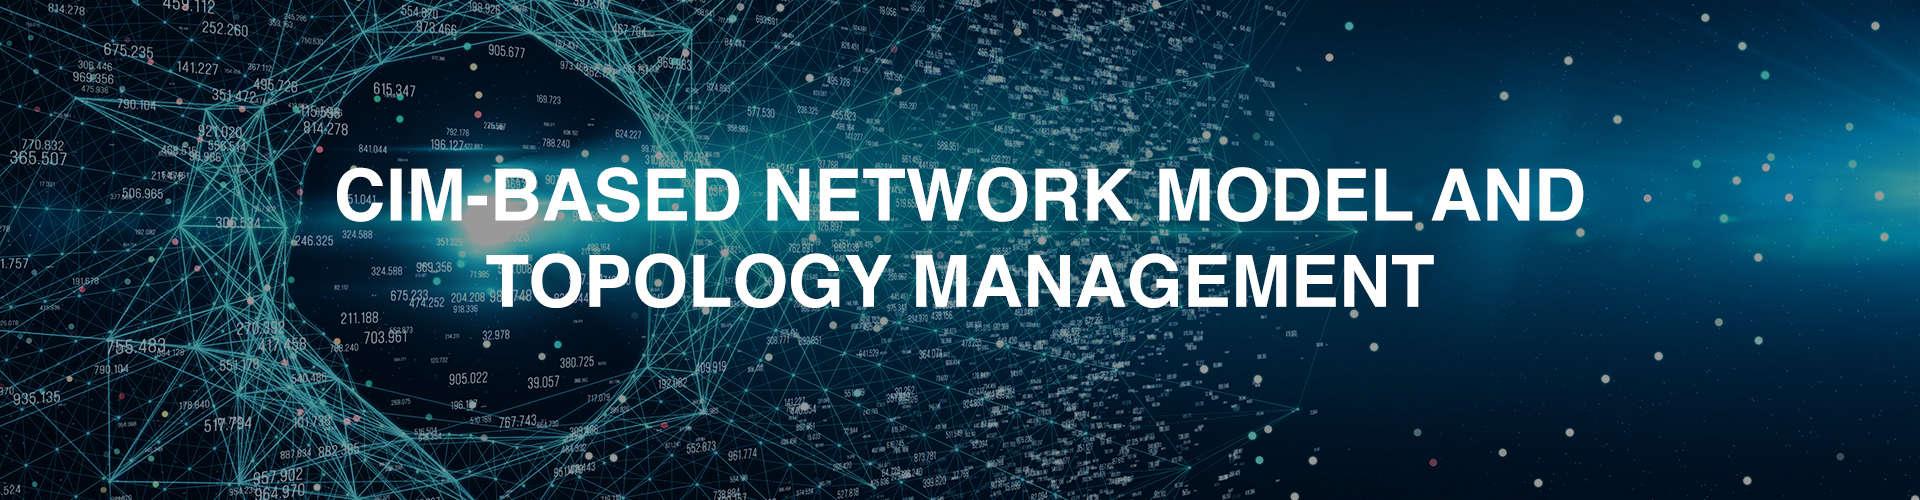 CIM-Based Network Model And Topology Management